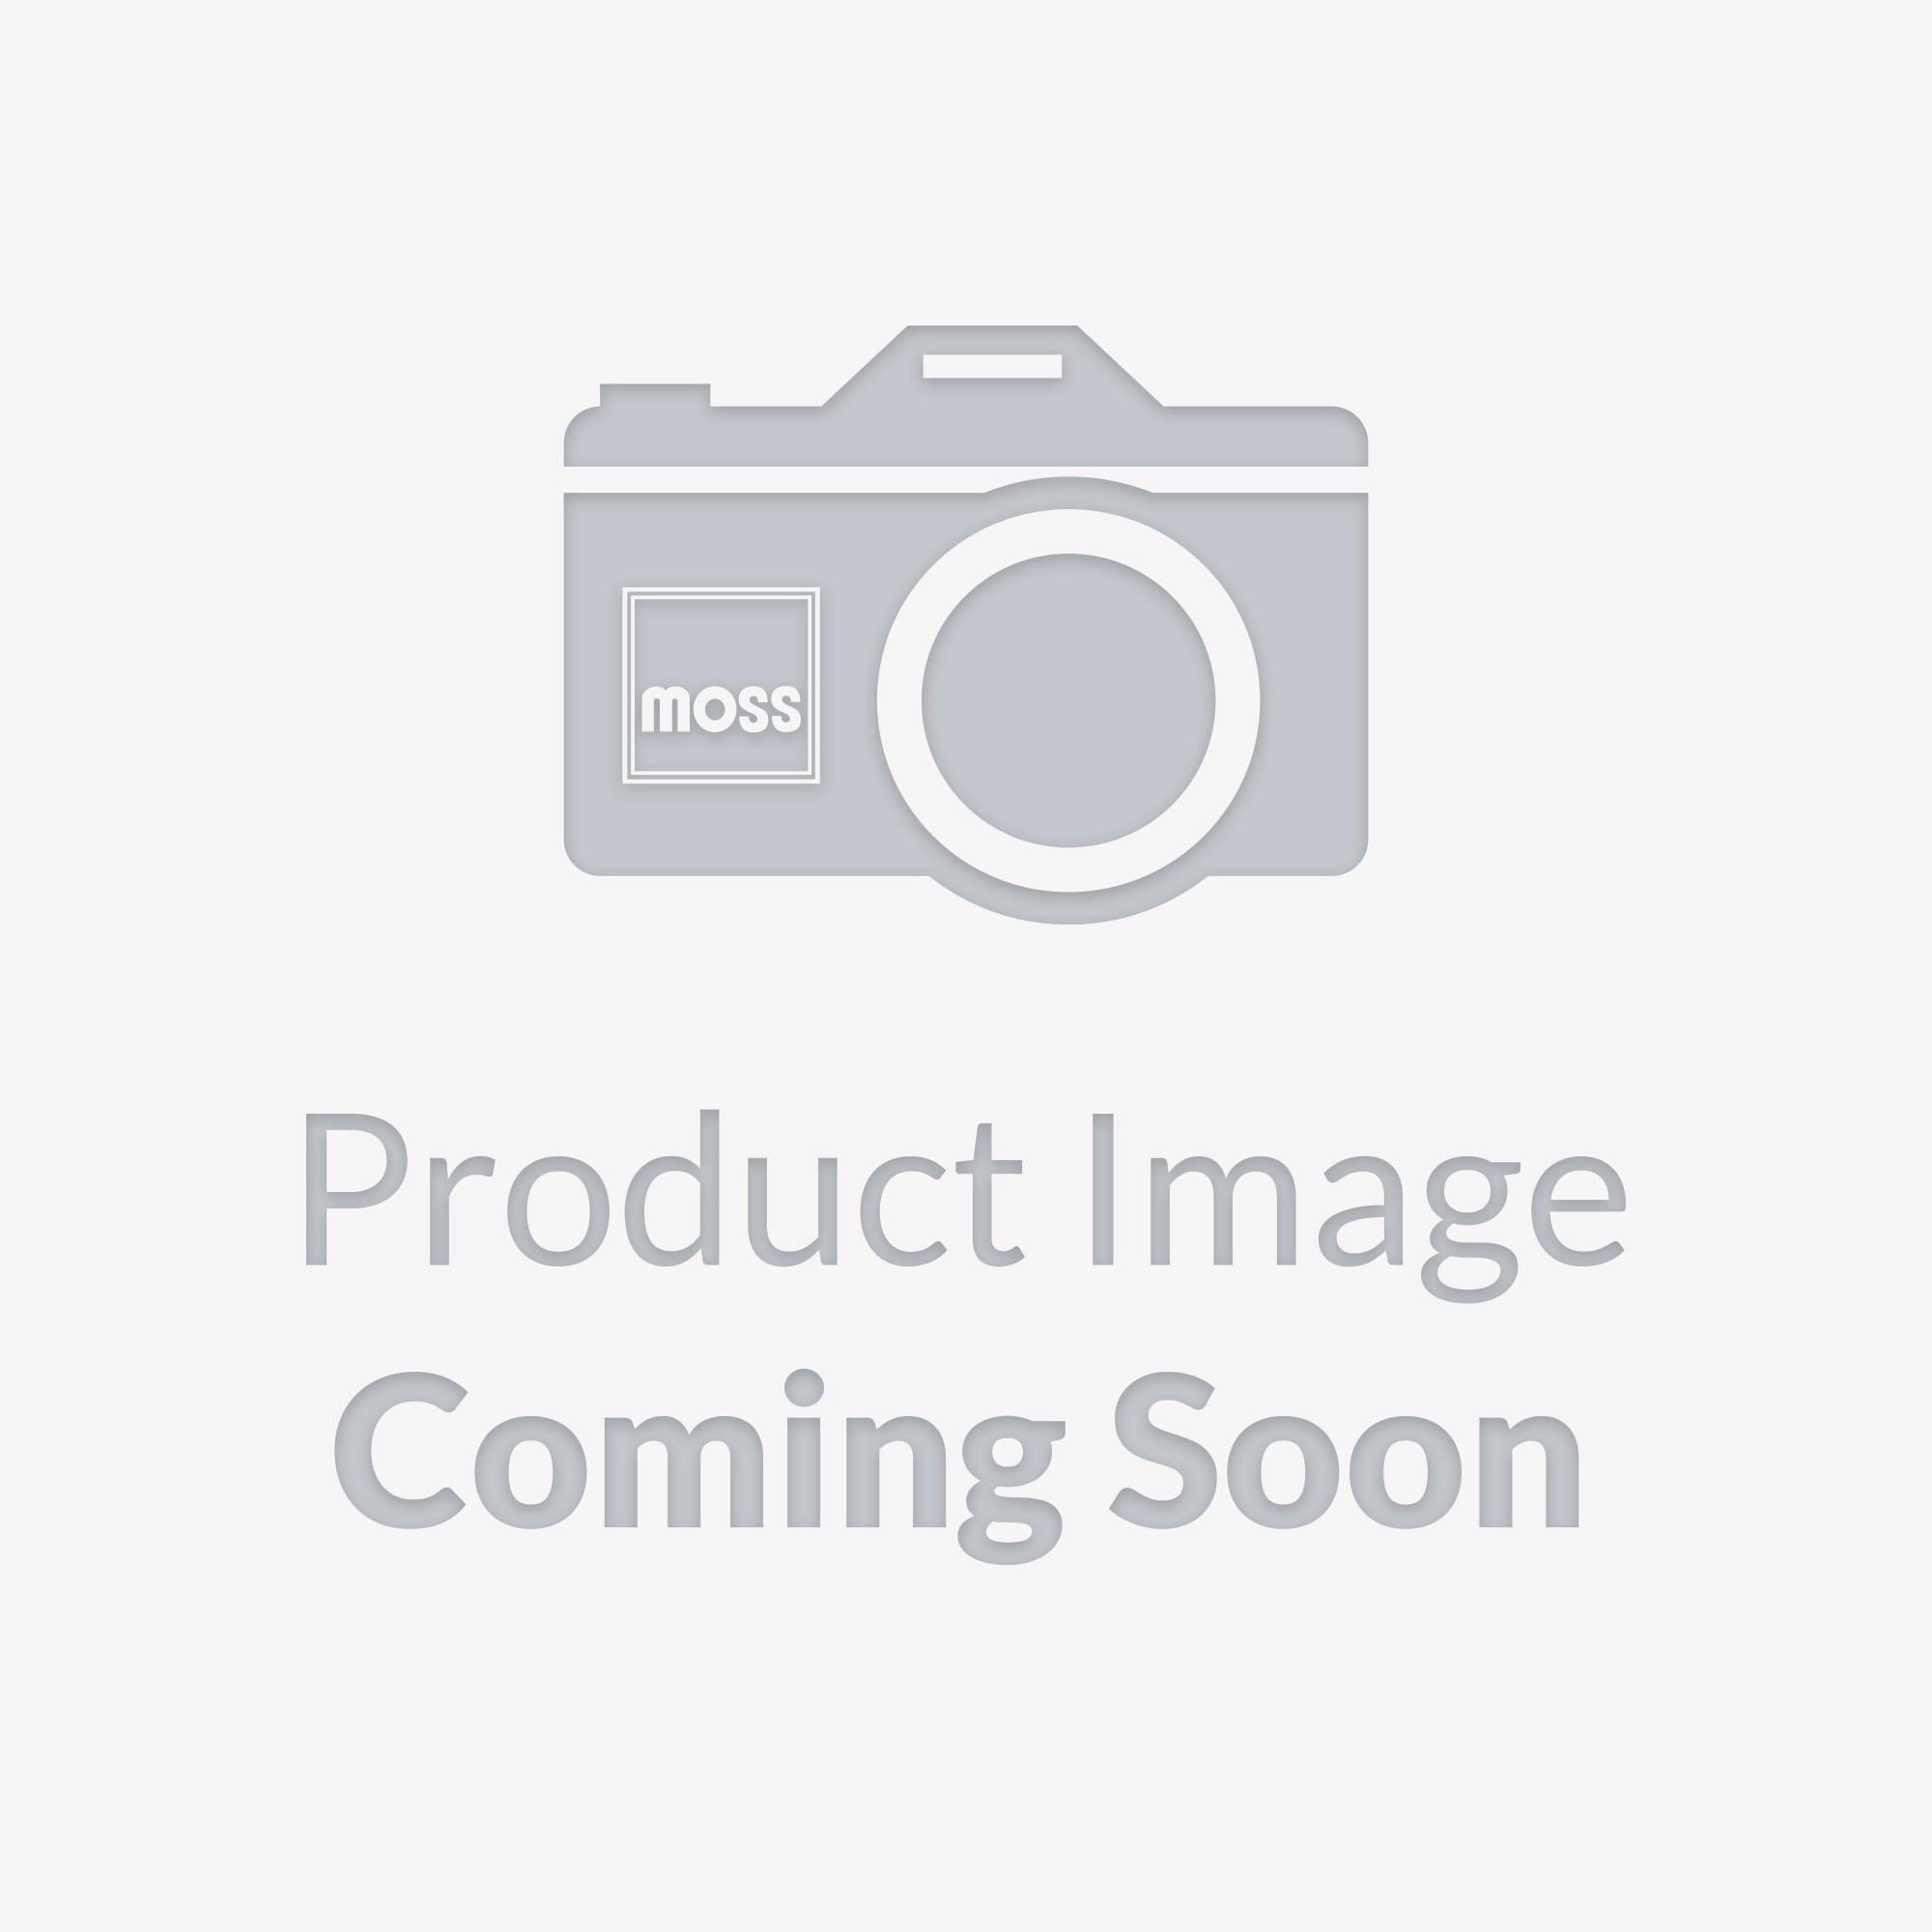 451 518 New Cylinder Head Moss Motors